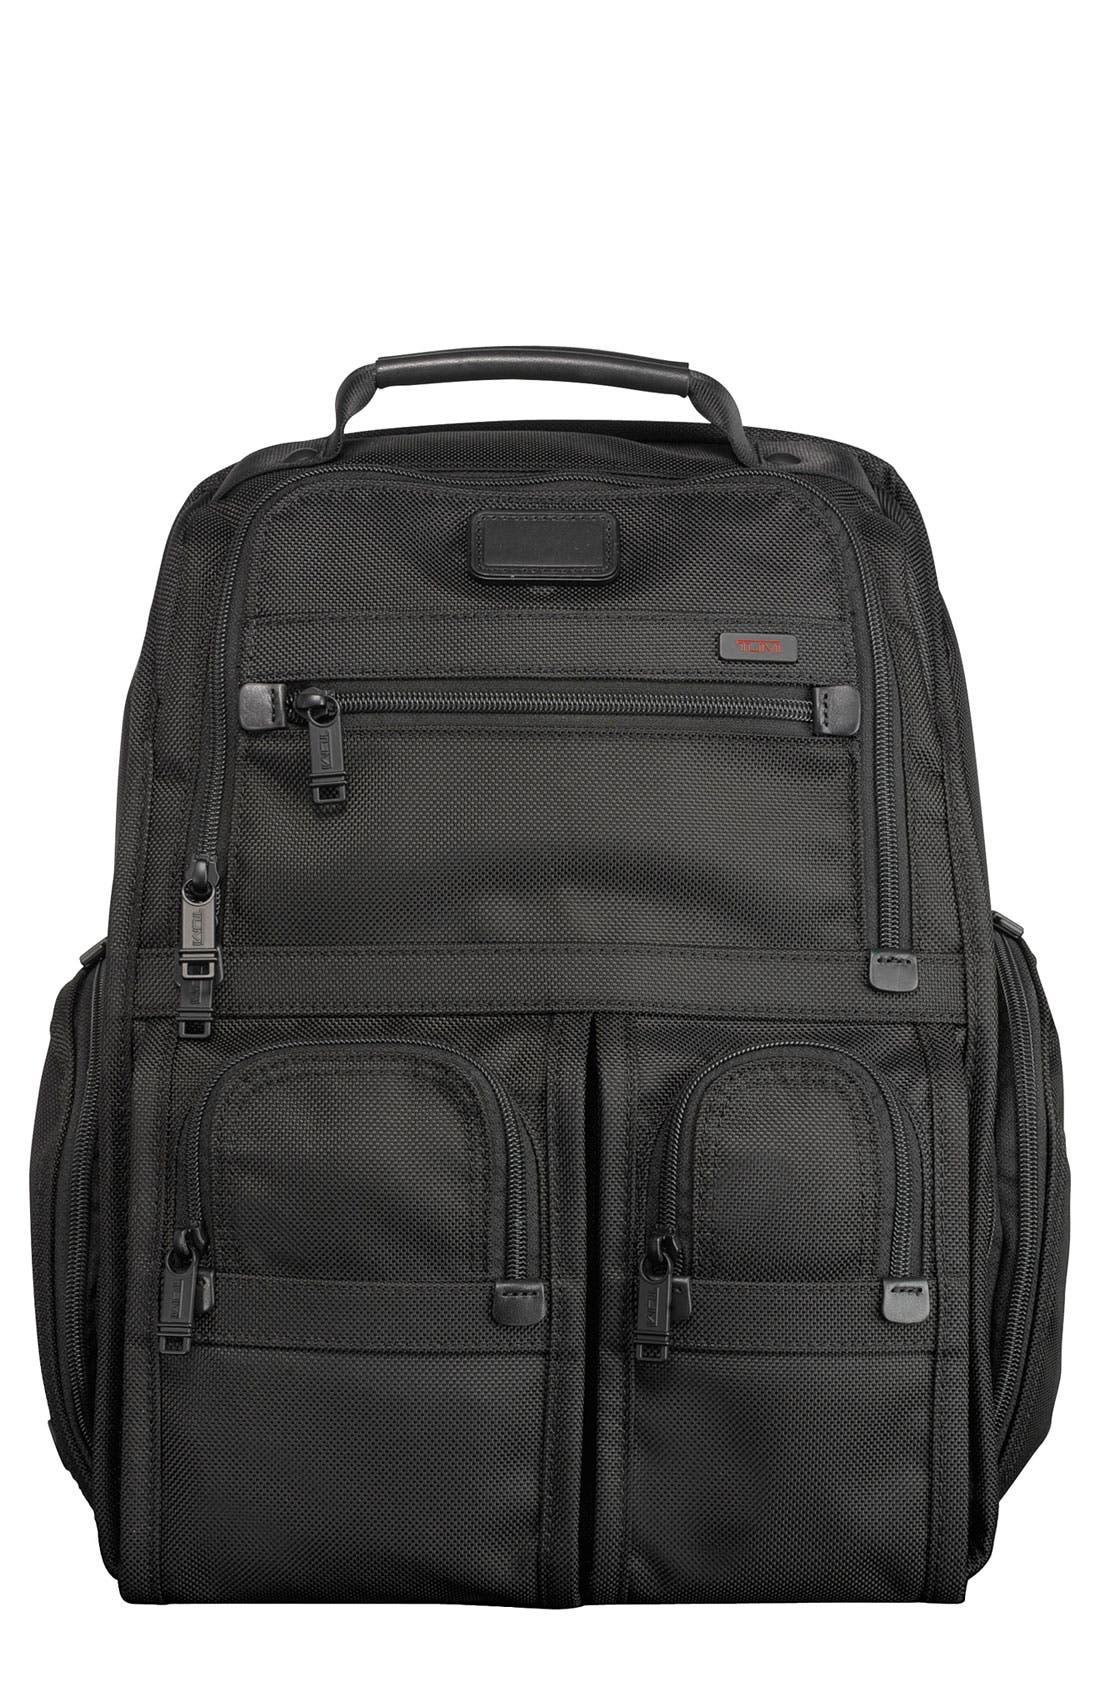 Main Image - Tumi 'Alpha' Compact Laptop BriefPack®